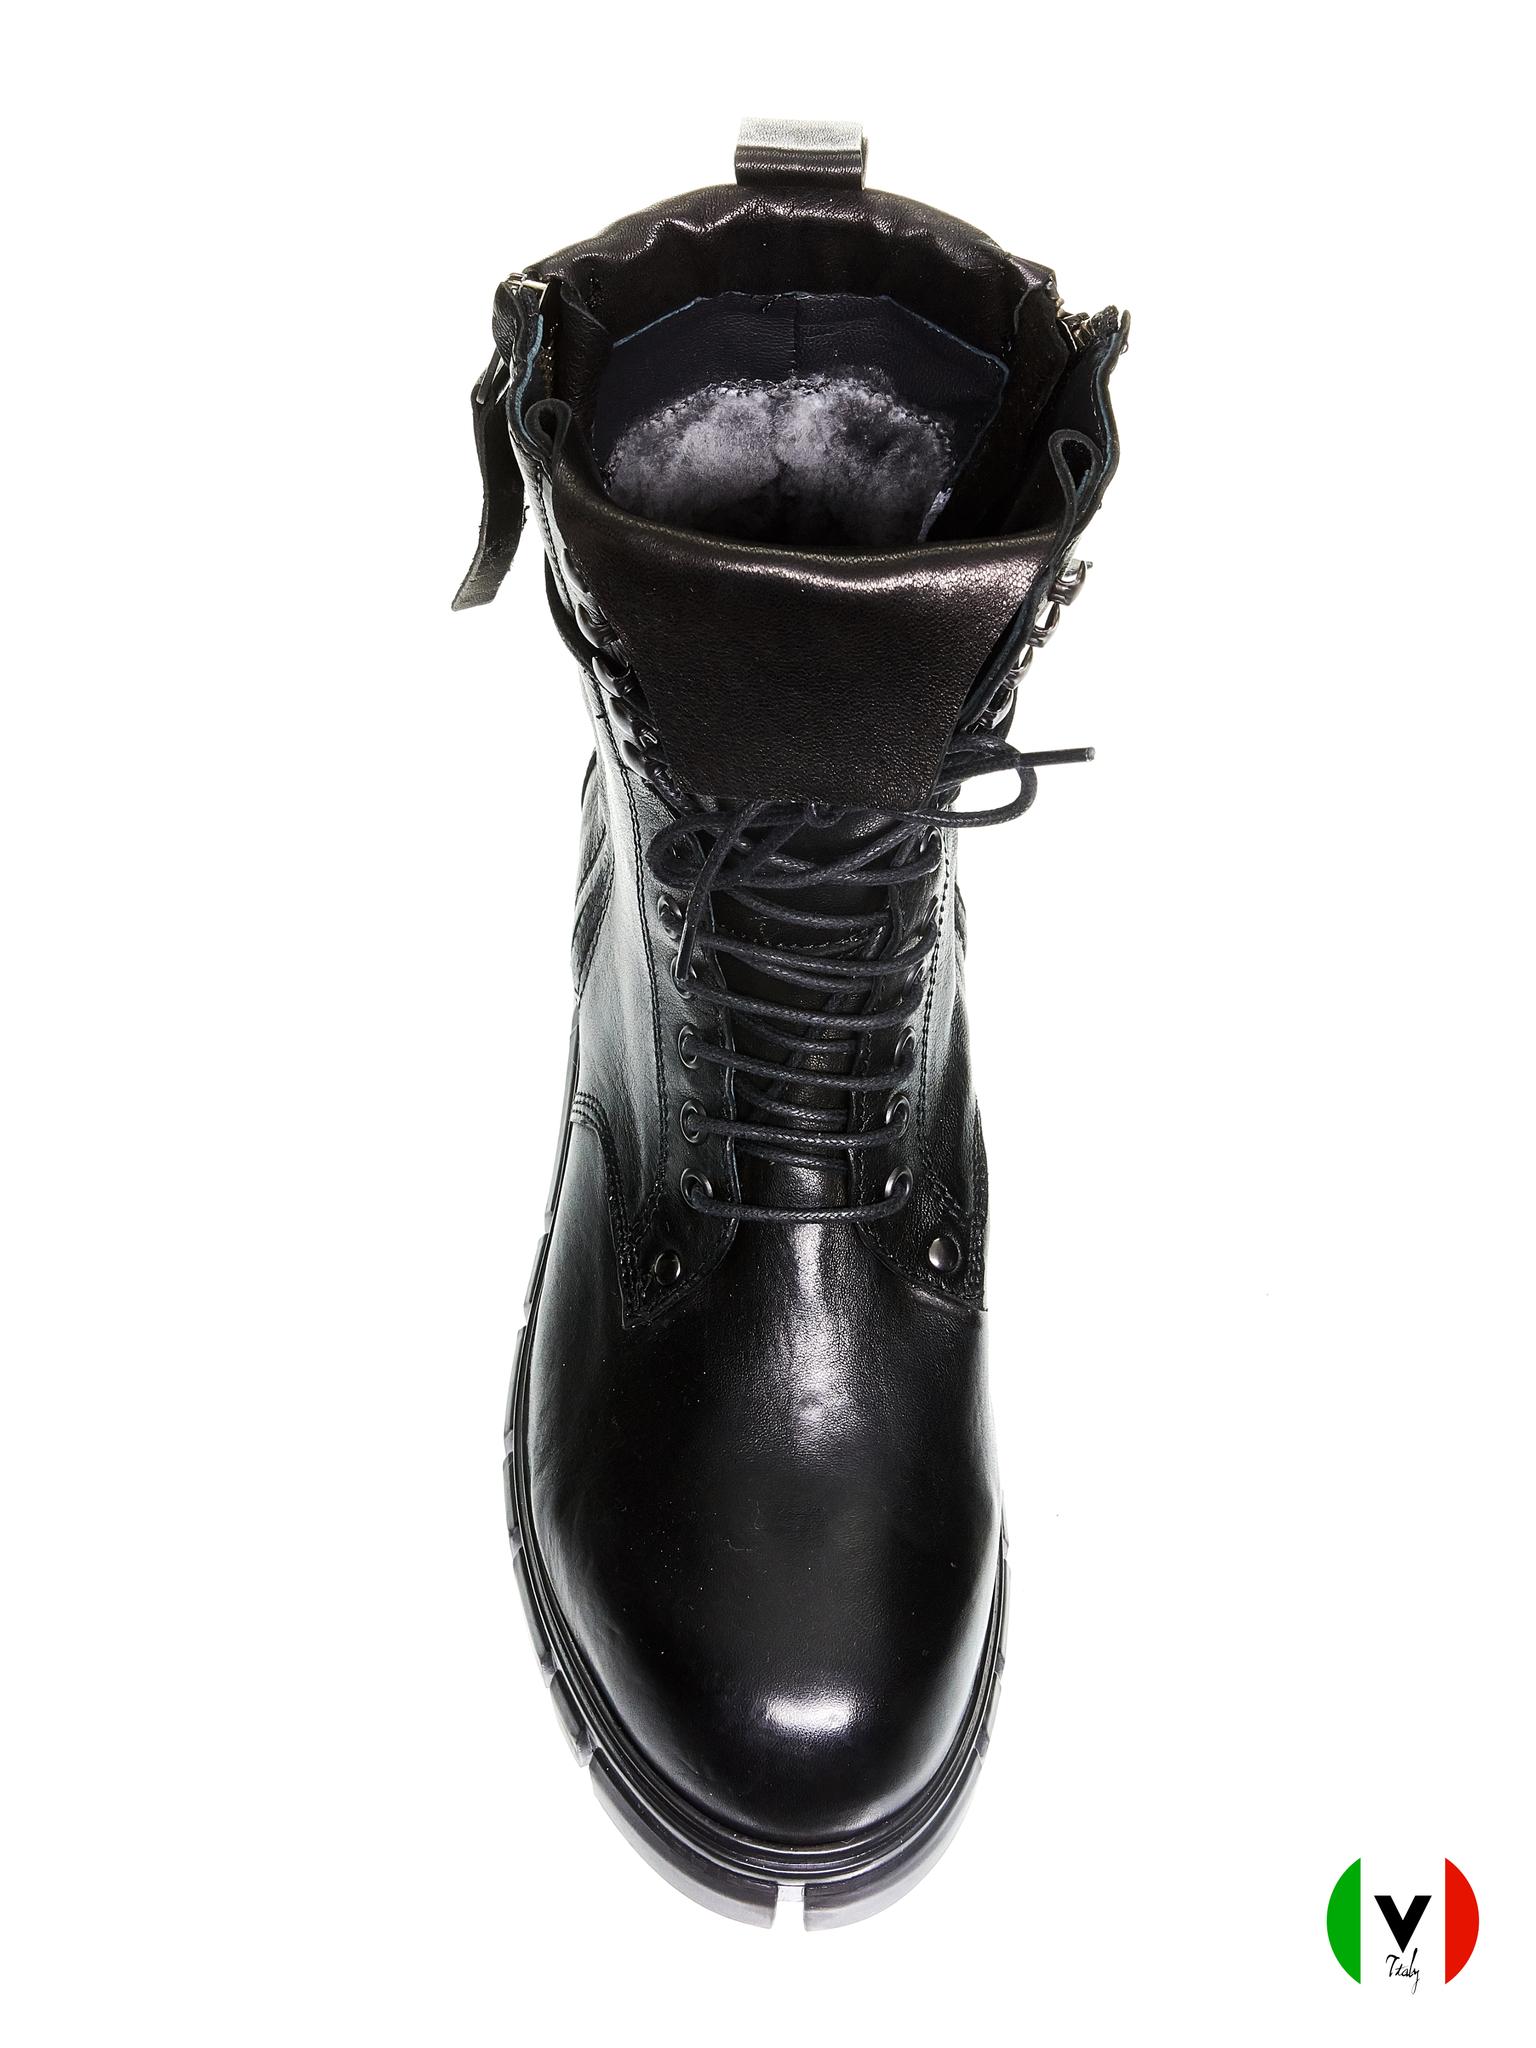 Ботинки Fru.it, артикул 4796, сезон зима, цвет чёрный, материал кожа, цена 19 500 руб., veroitaly.ru